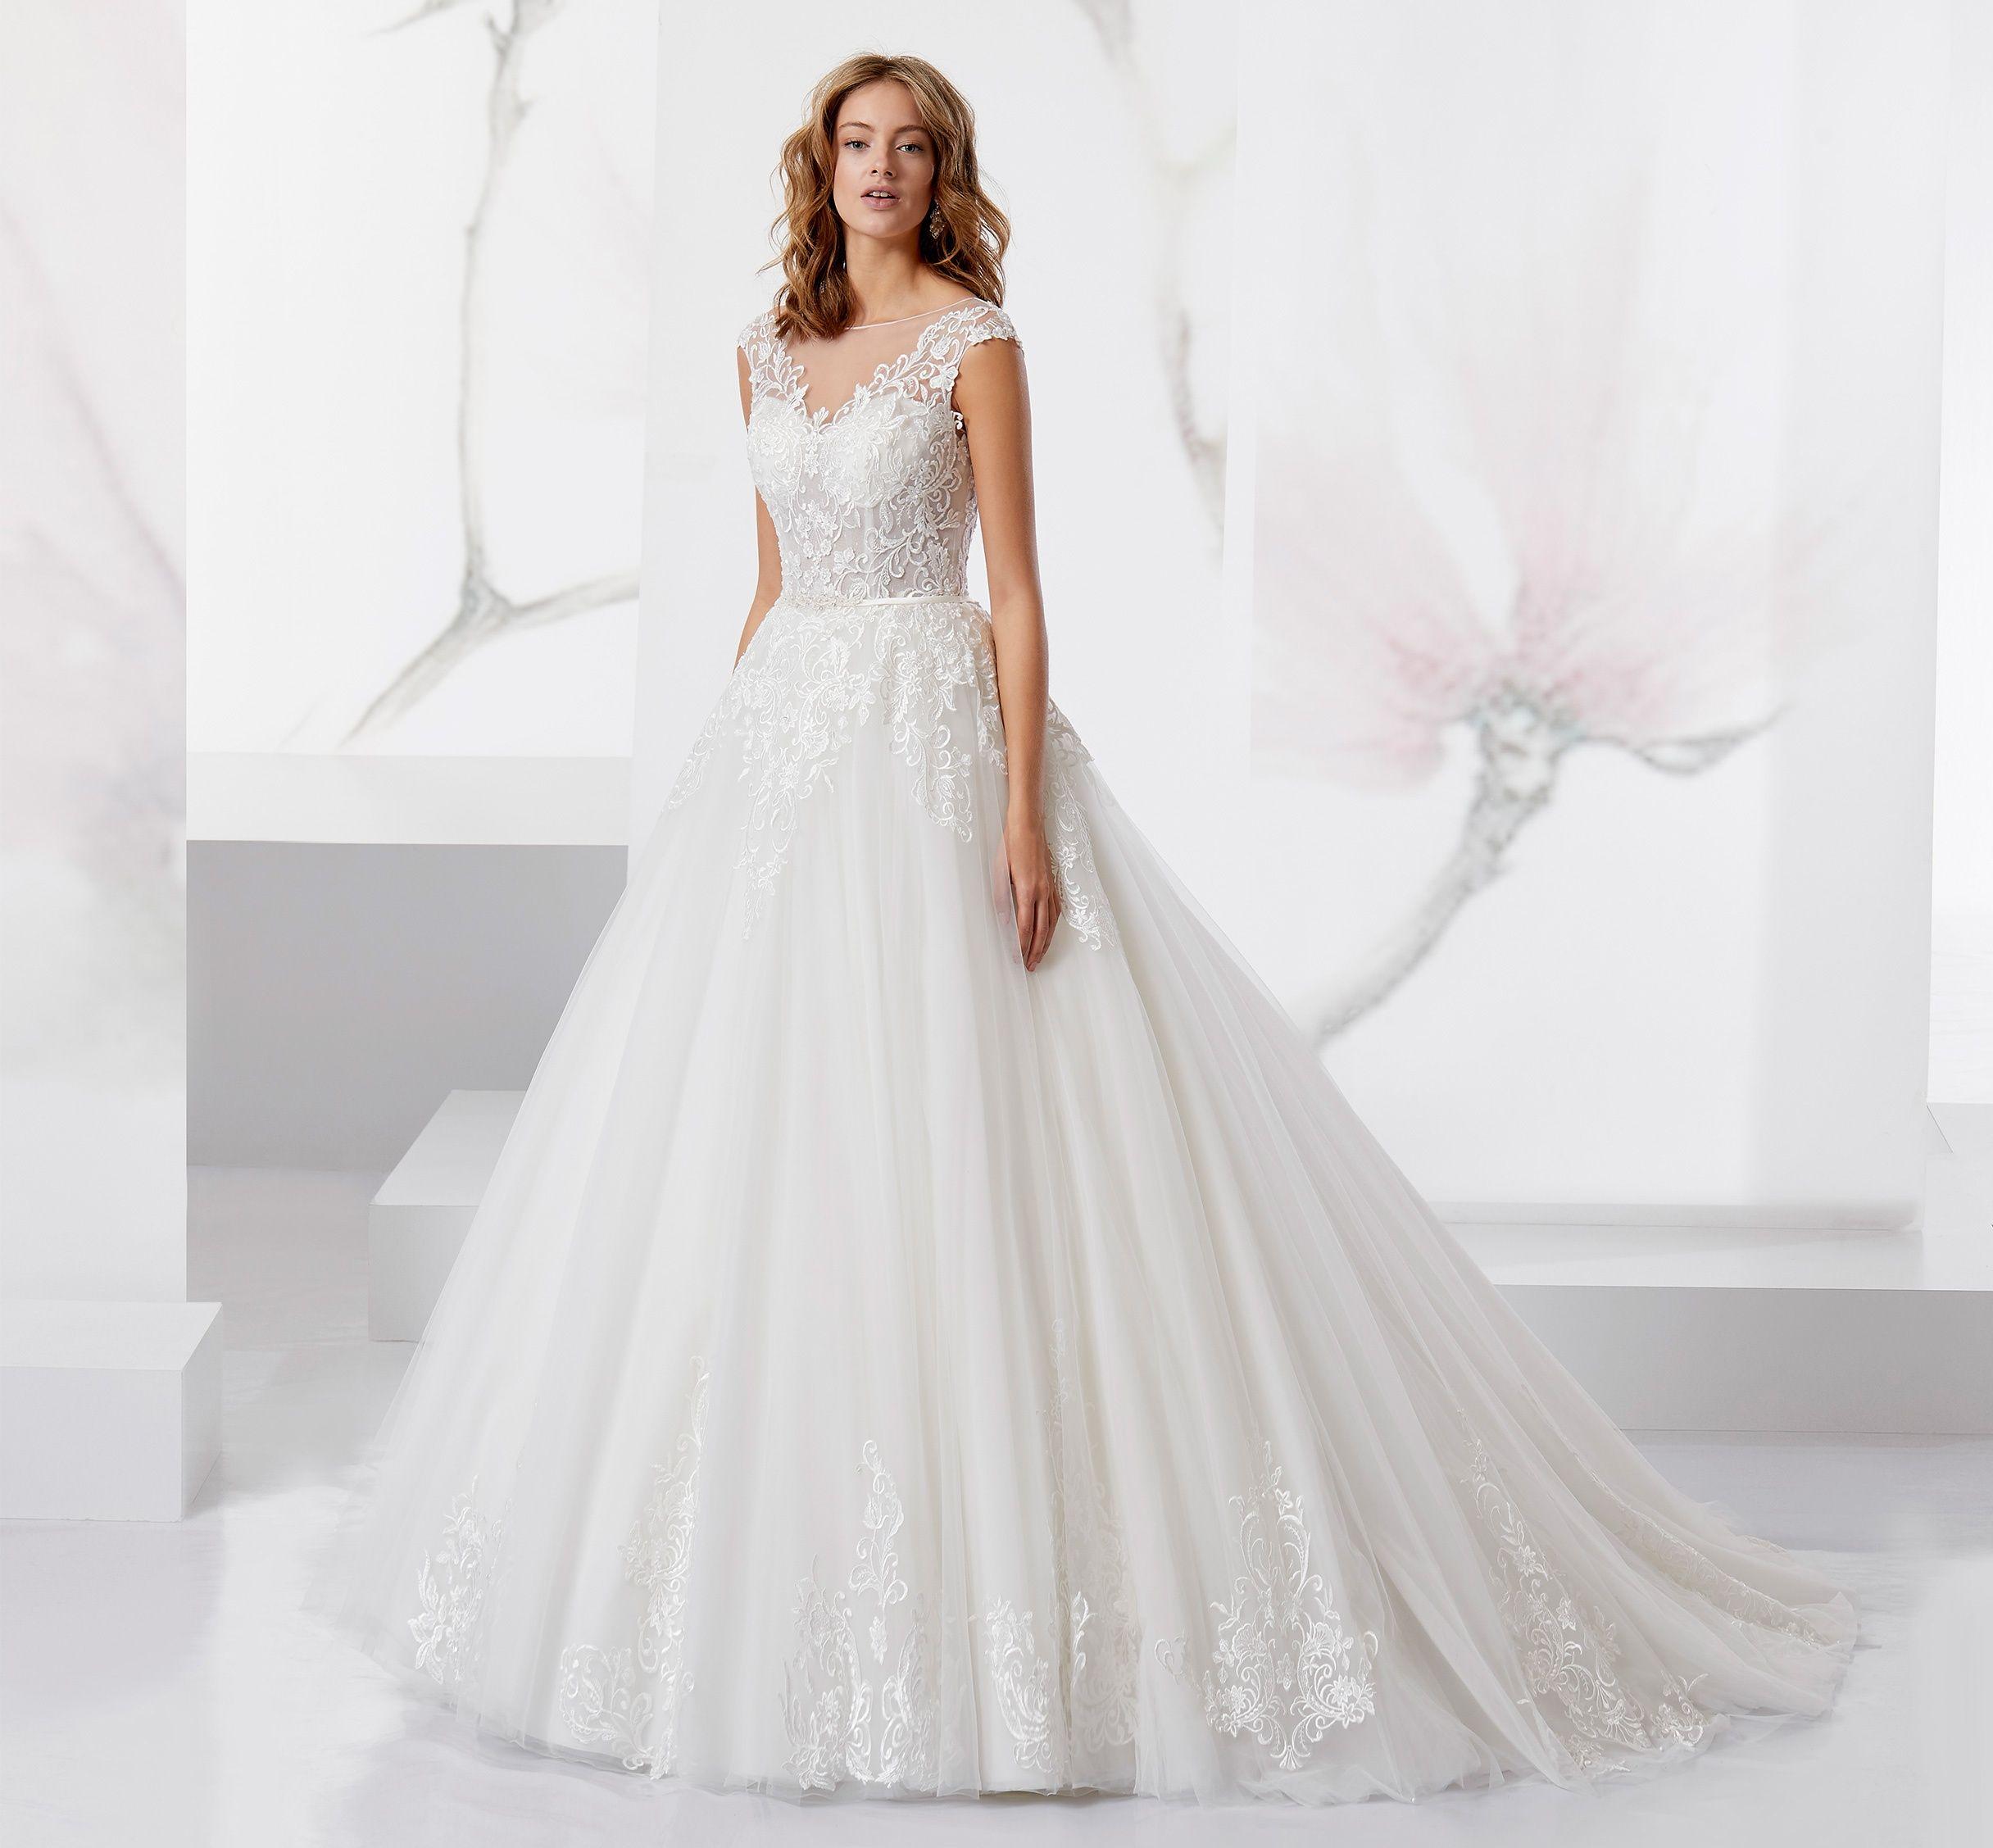 43+ Nicole wedding dress uk information